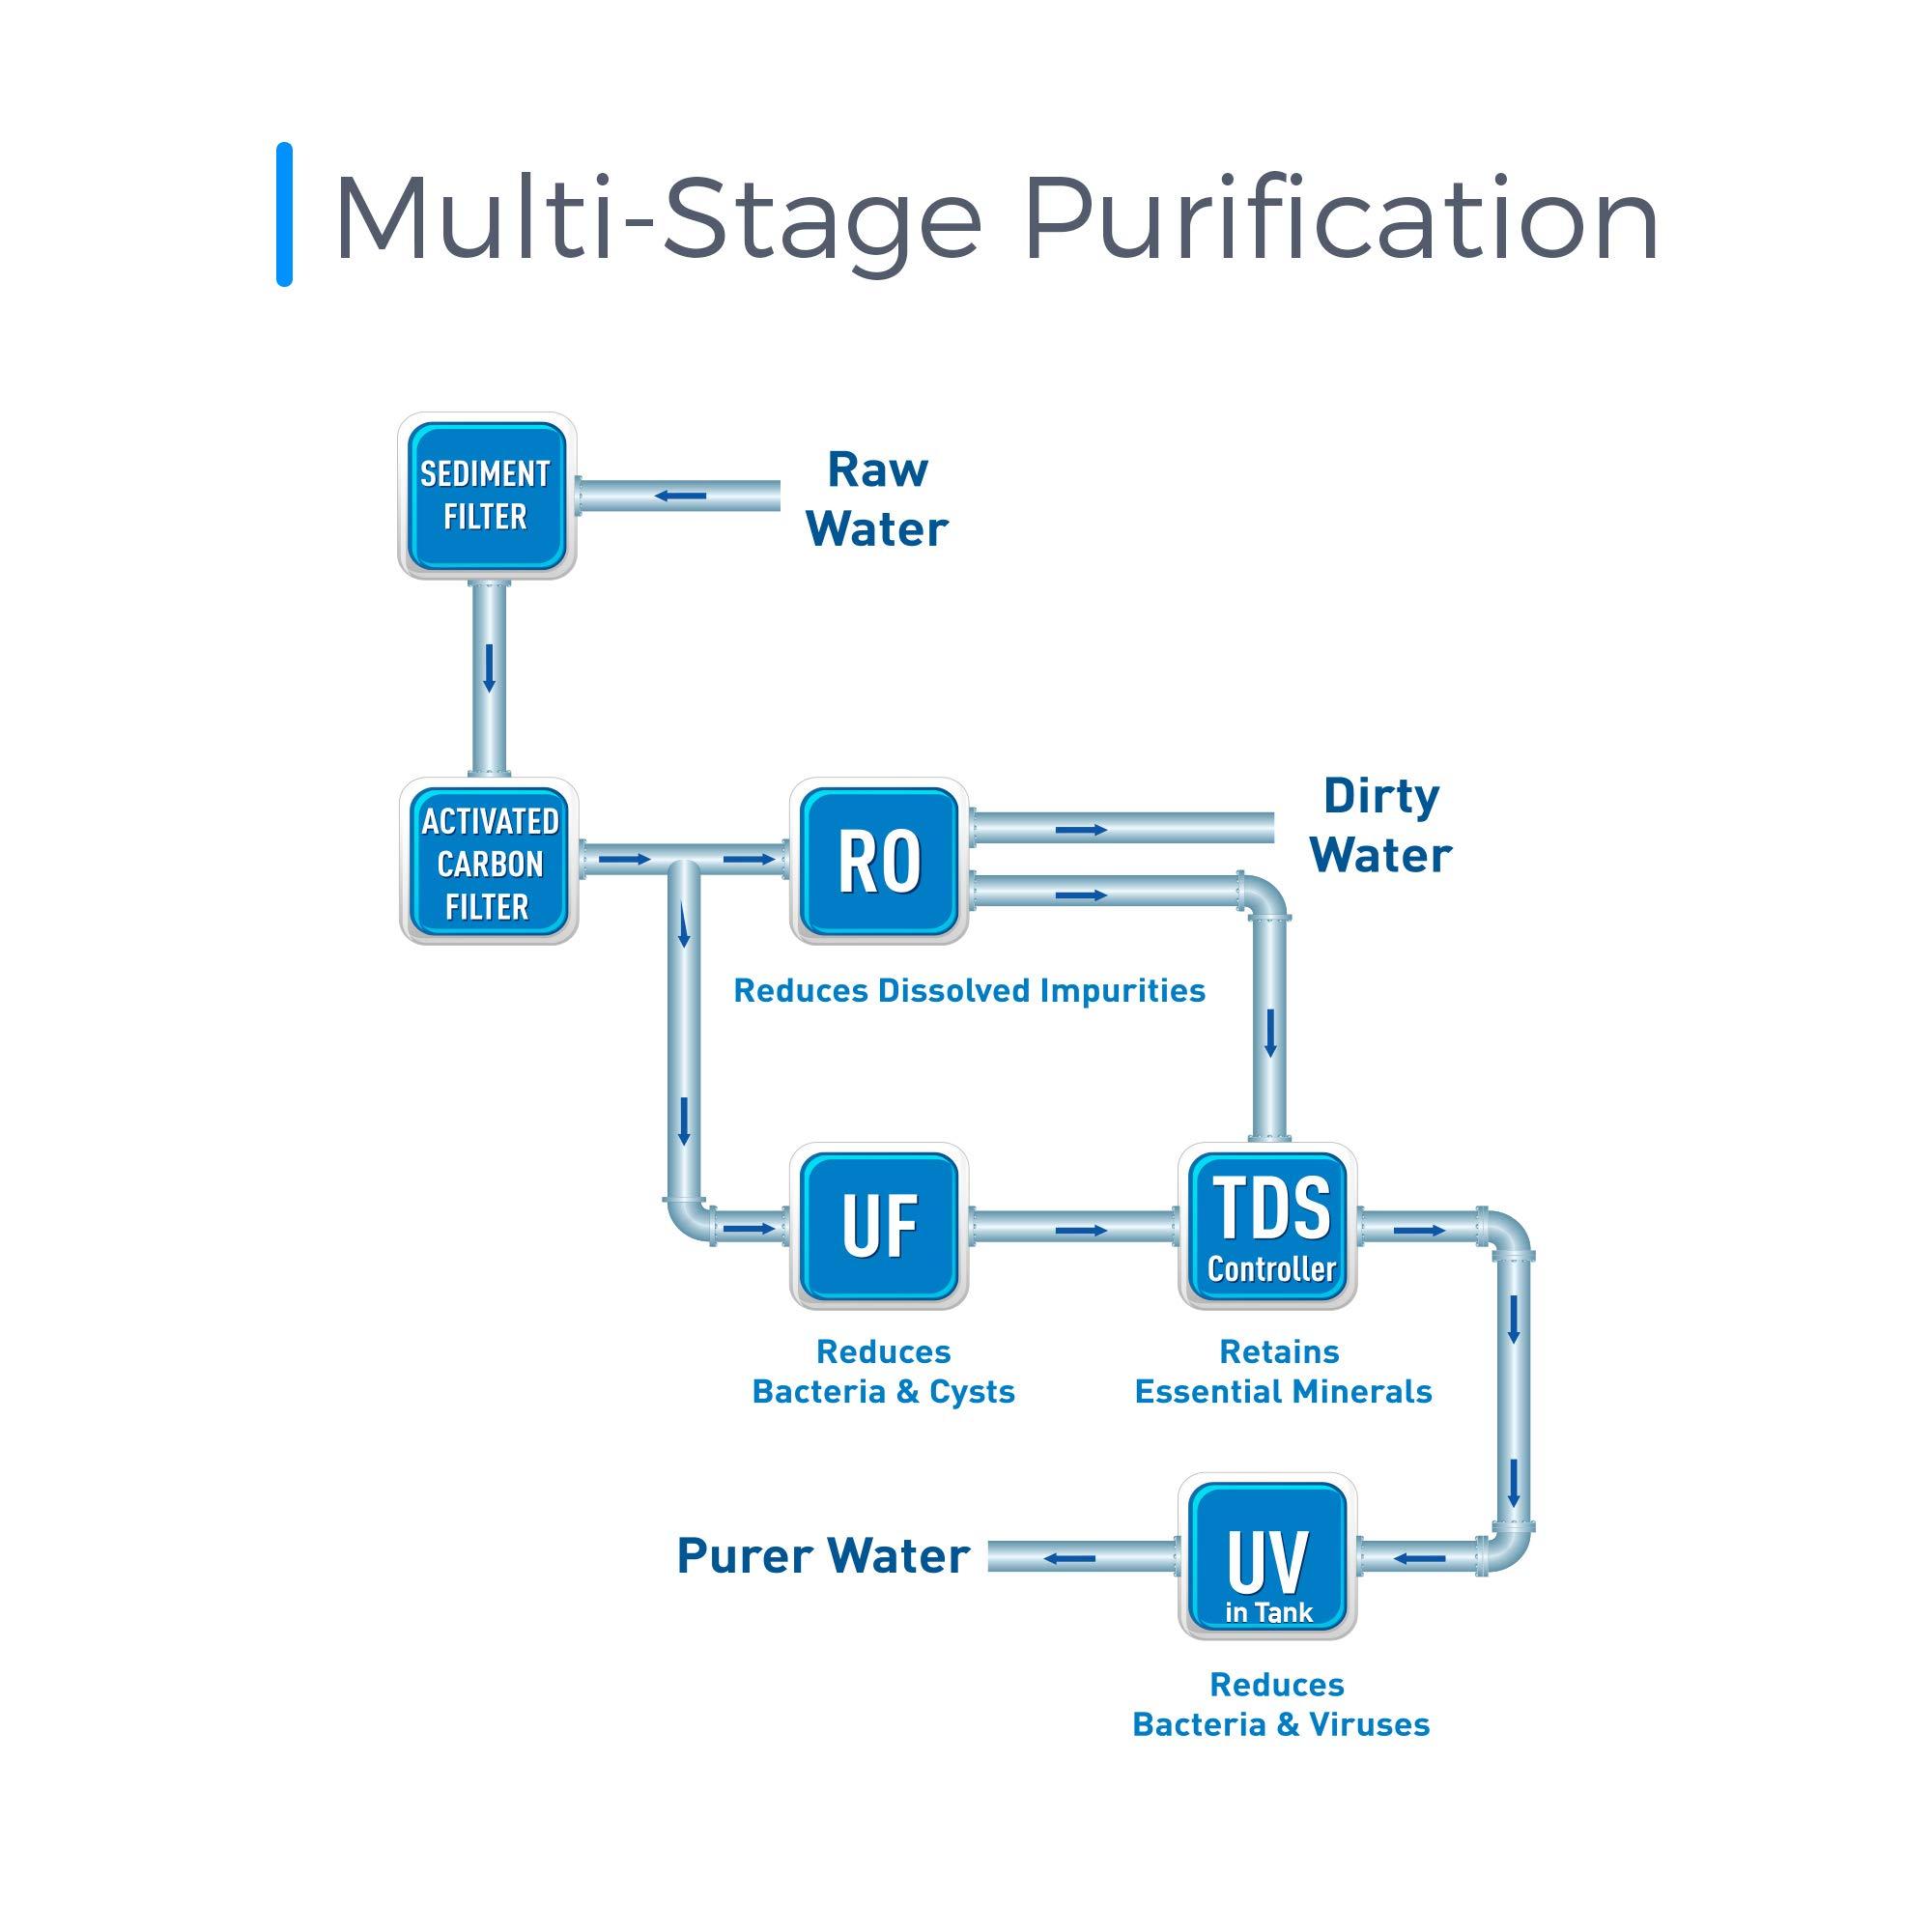 Best Kent Water Purifier Models 2019 - UV, UF, RO Purifiers